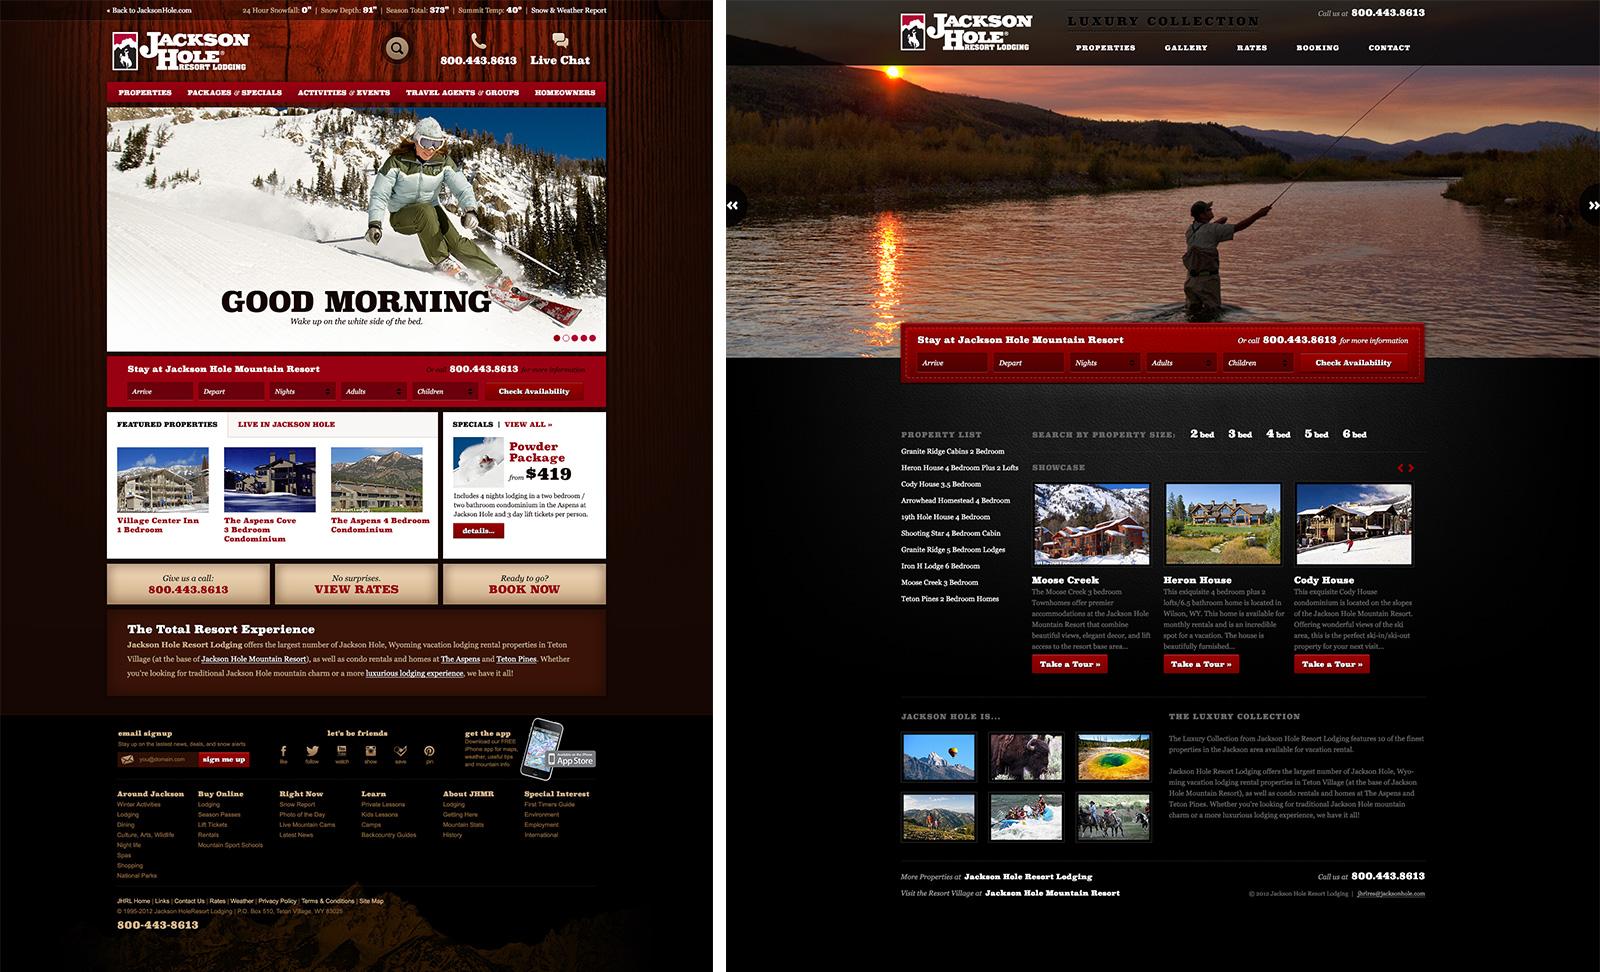 Jackson Hole Mountain Resort Website and Branding Design – Sample Html Email